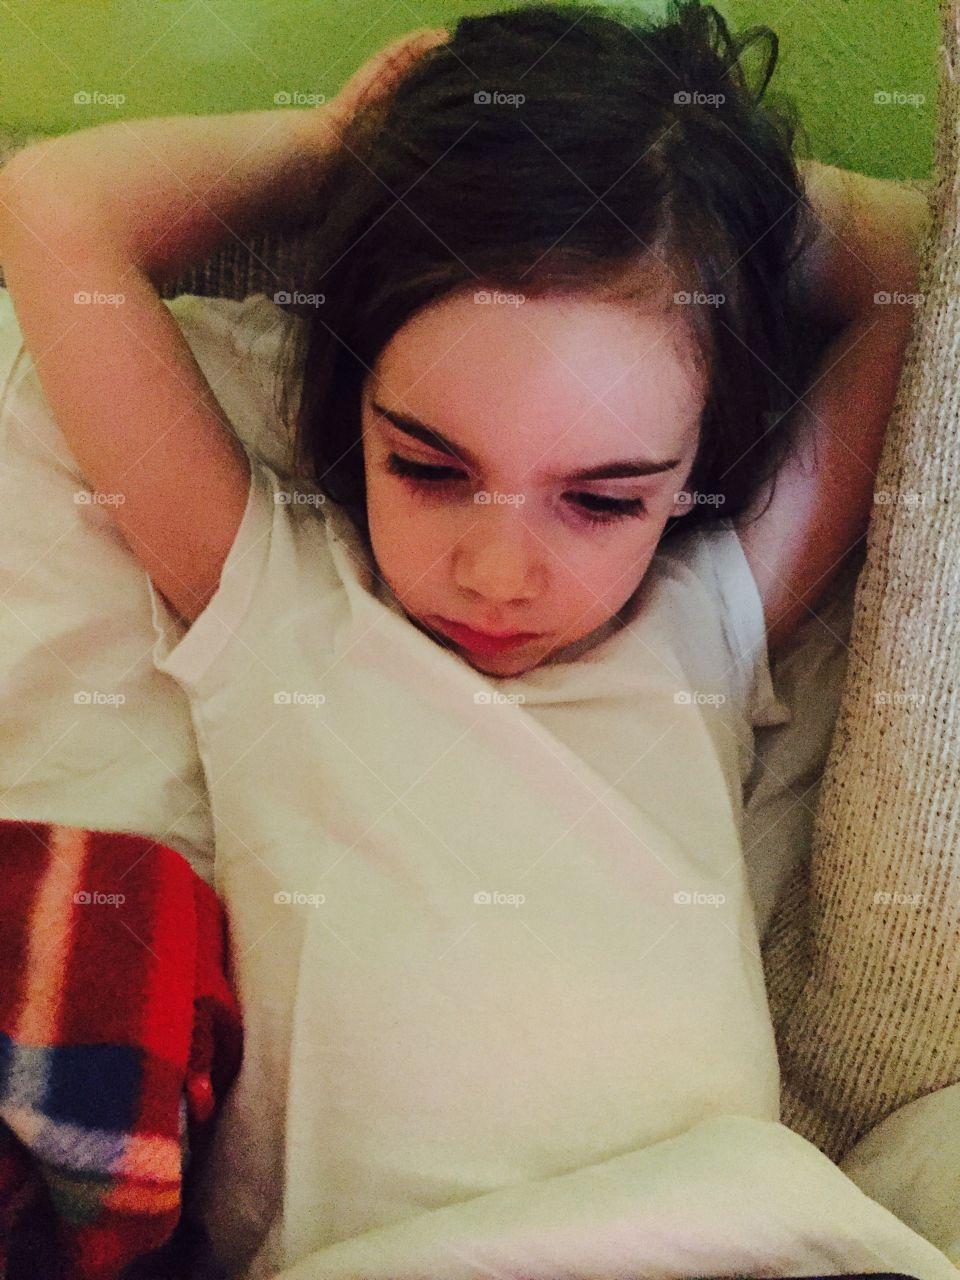 Cute girl leaning on sofa